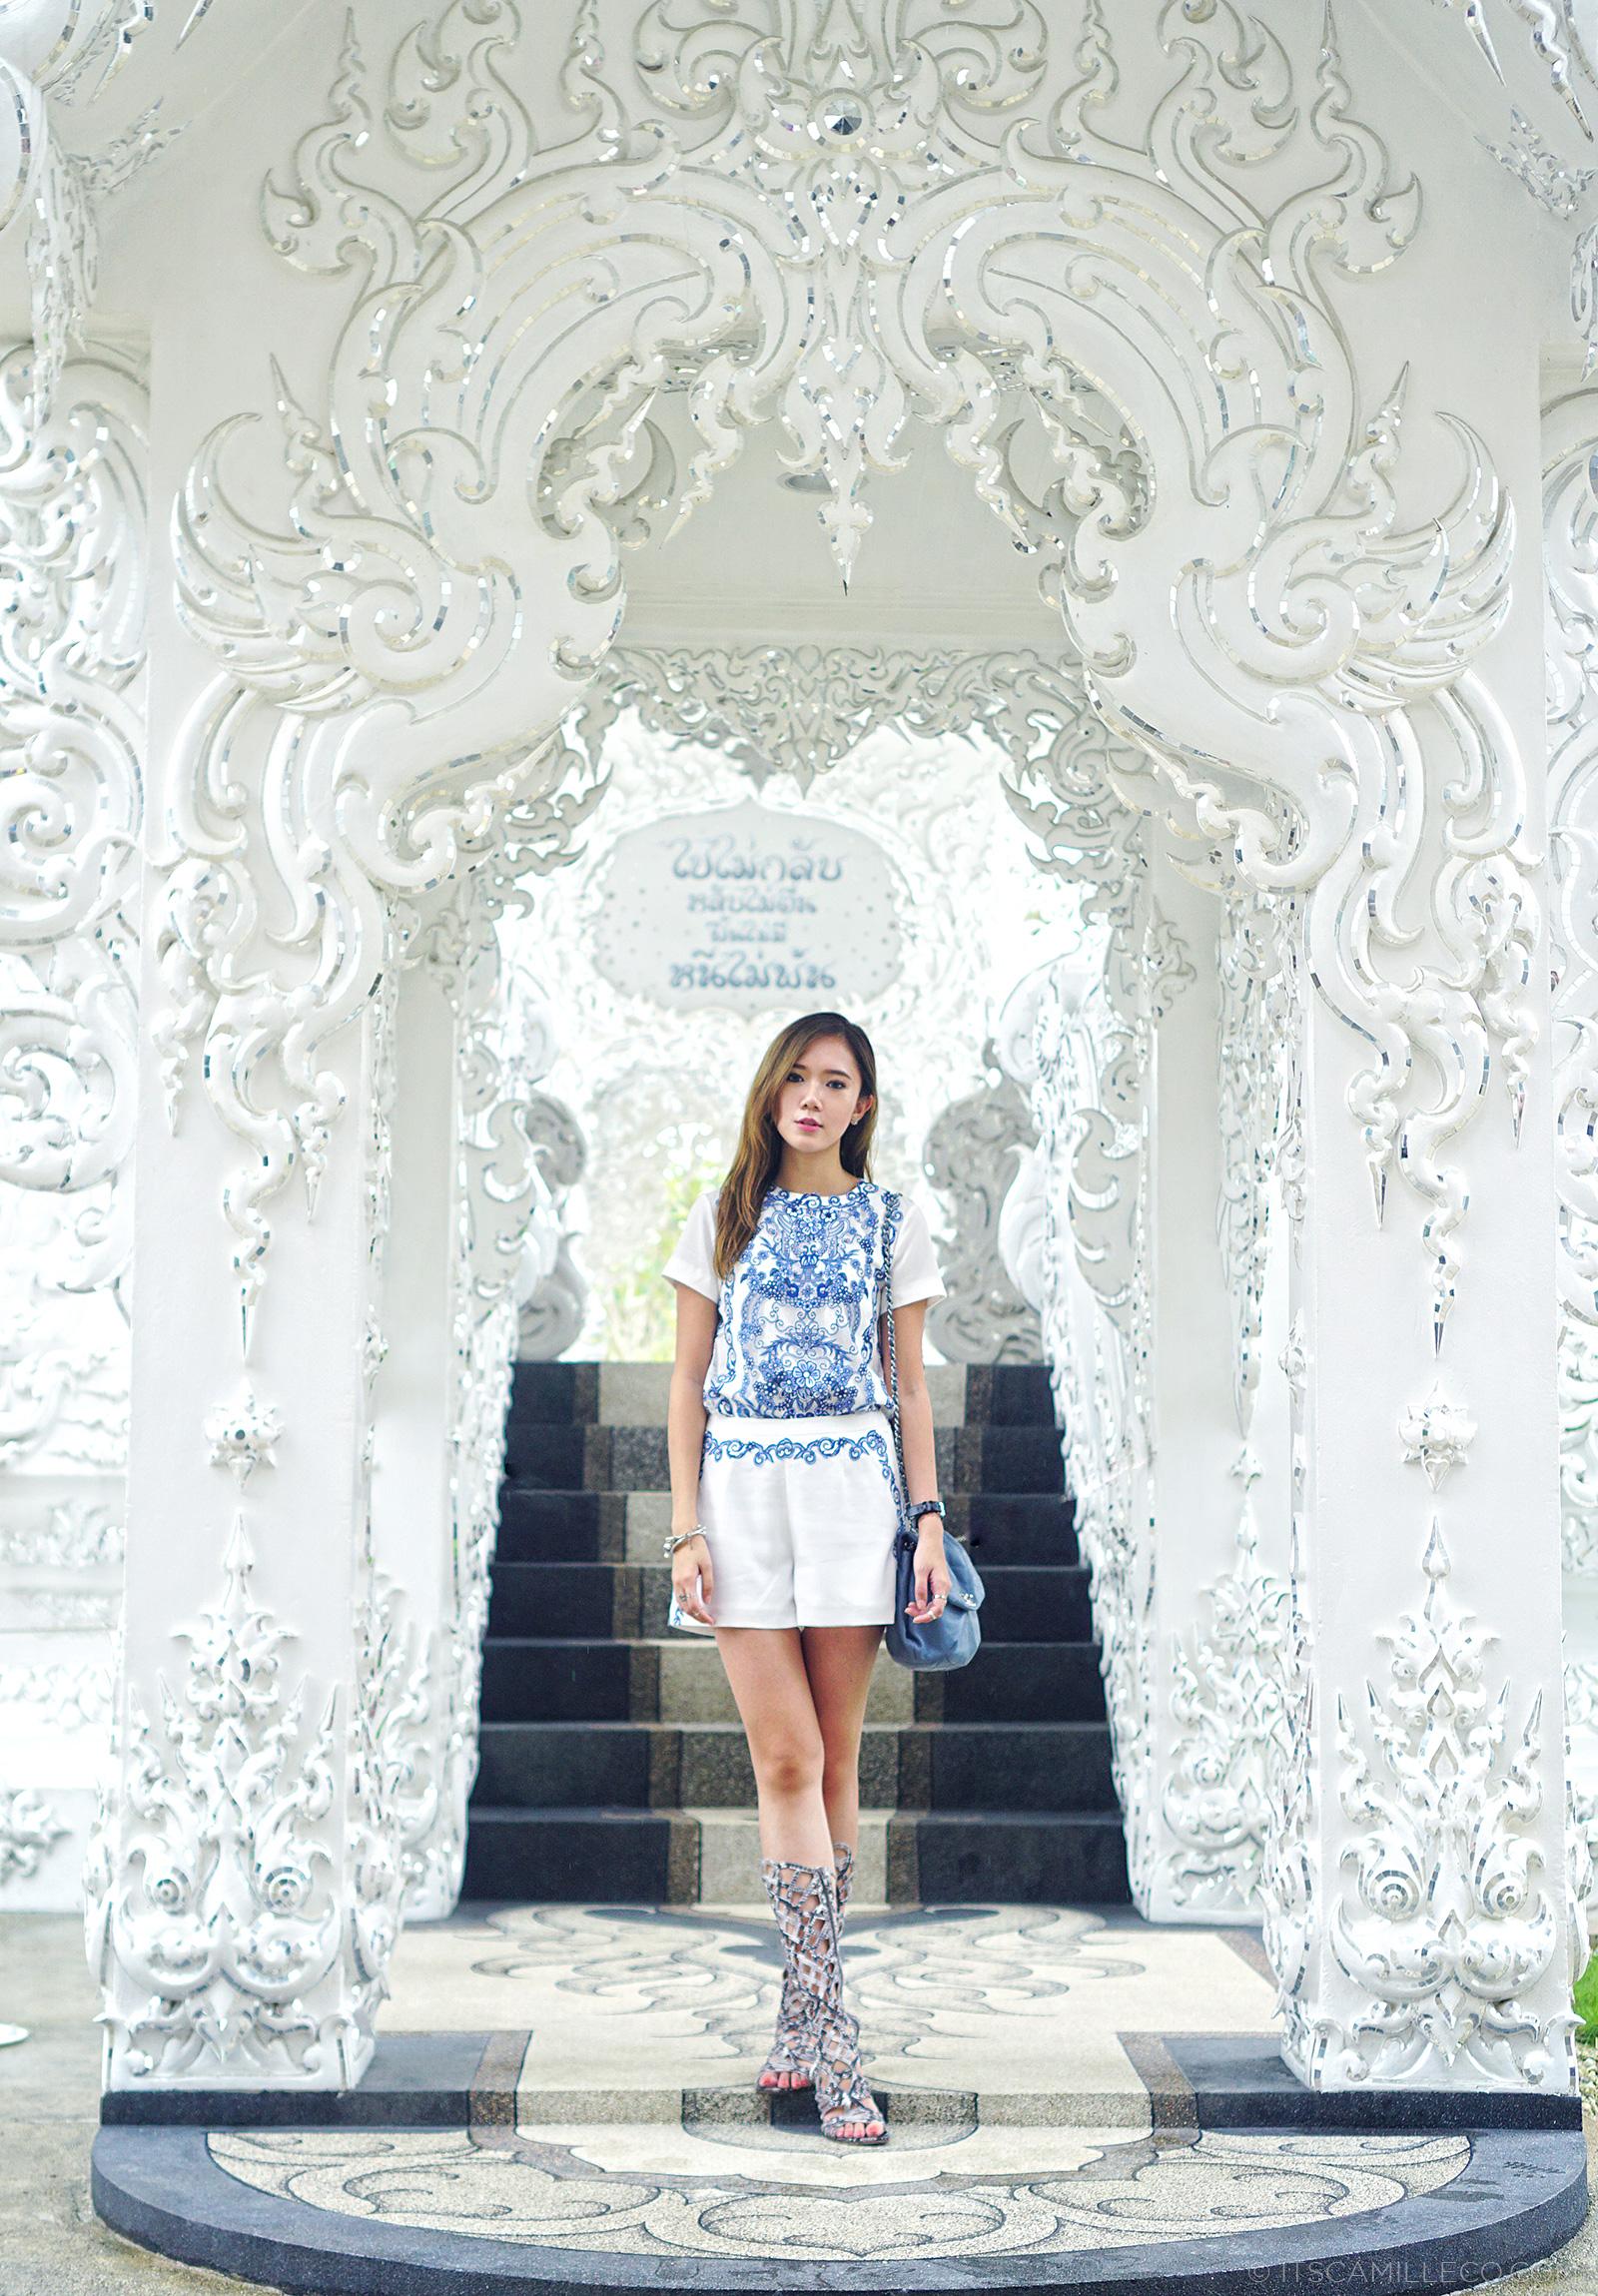 Wat Rong Khun, White Temple, Chiang Rai | www.itscamilleco.com